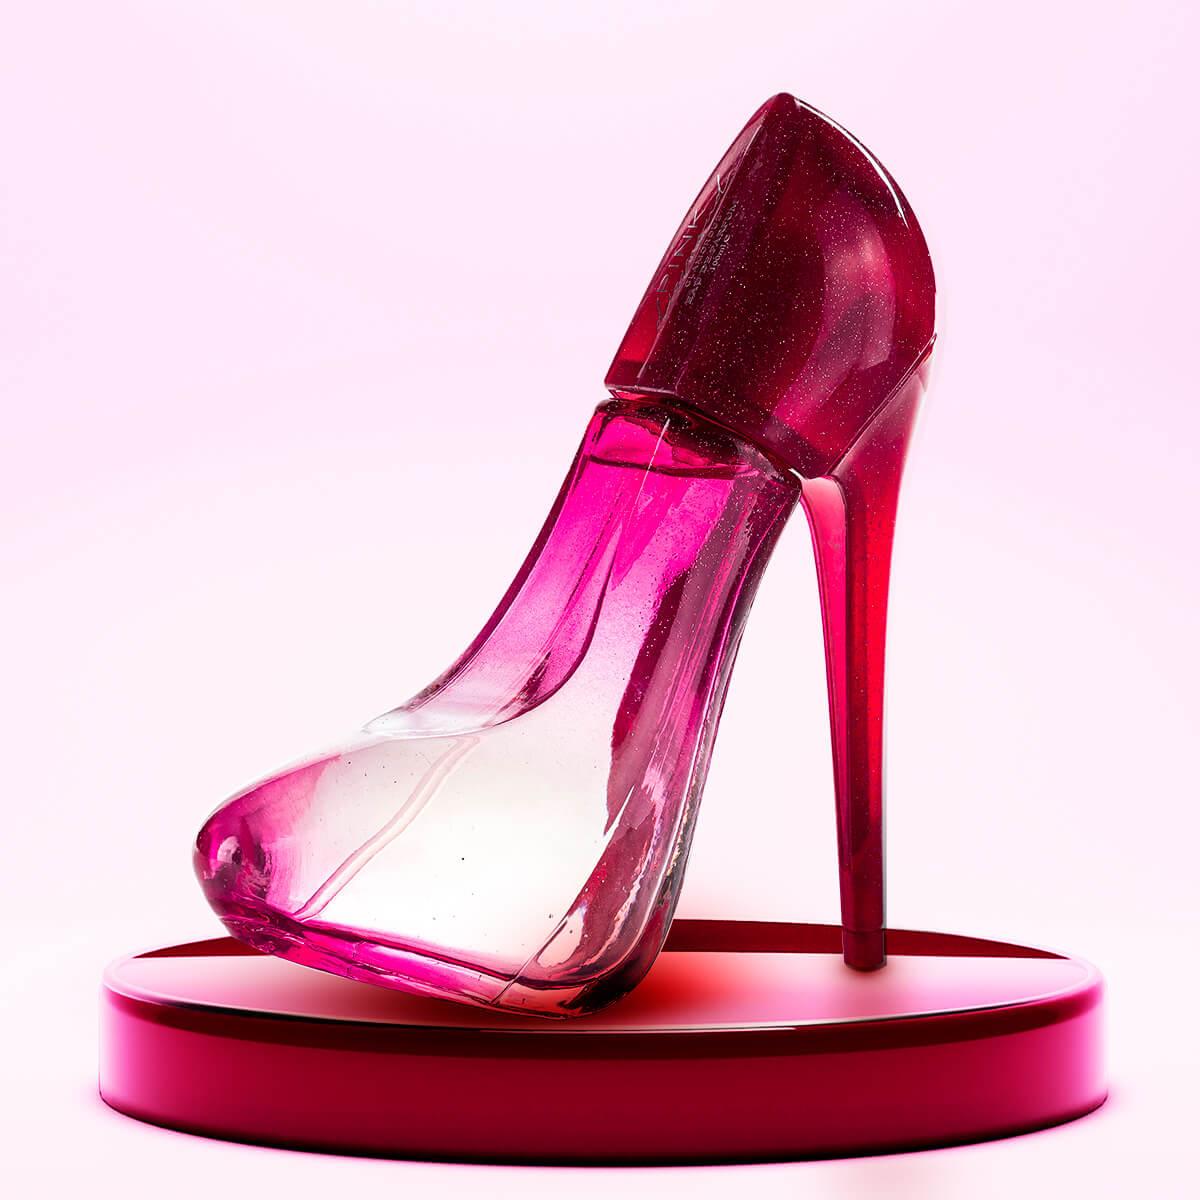 Perfume Sapatinho Pink Diamond Feminino 100ml EDP Giverny